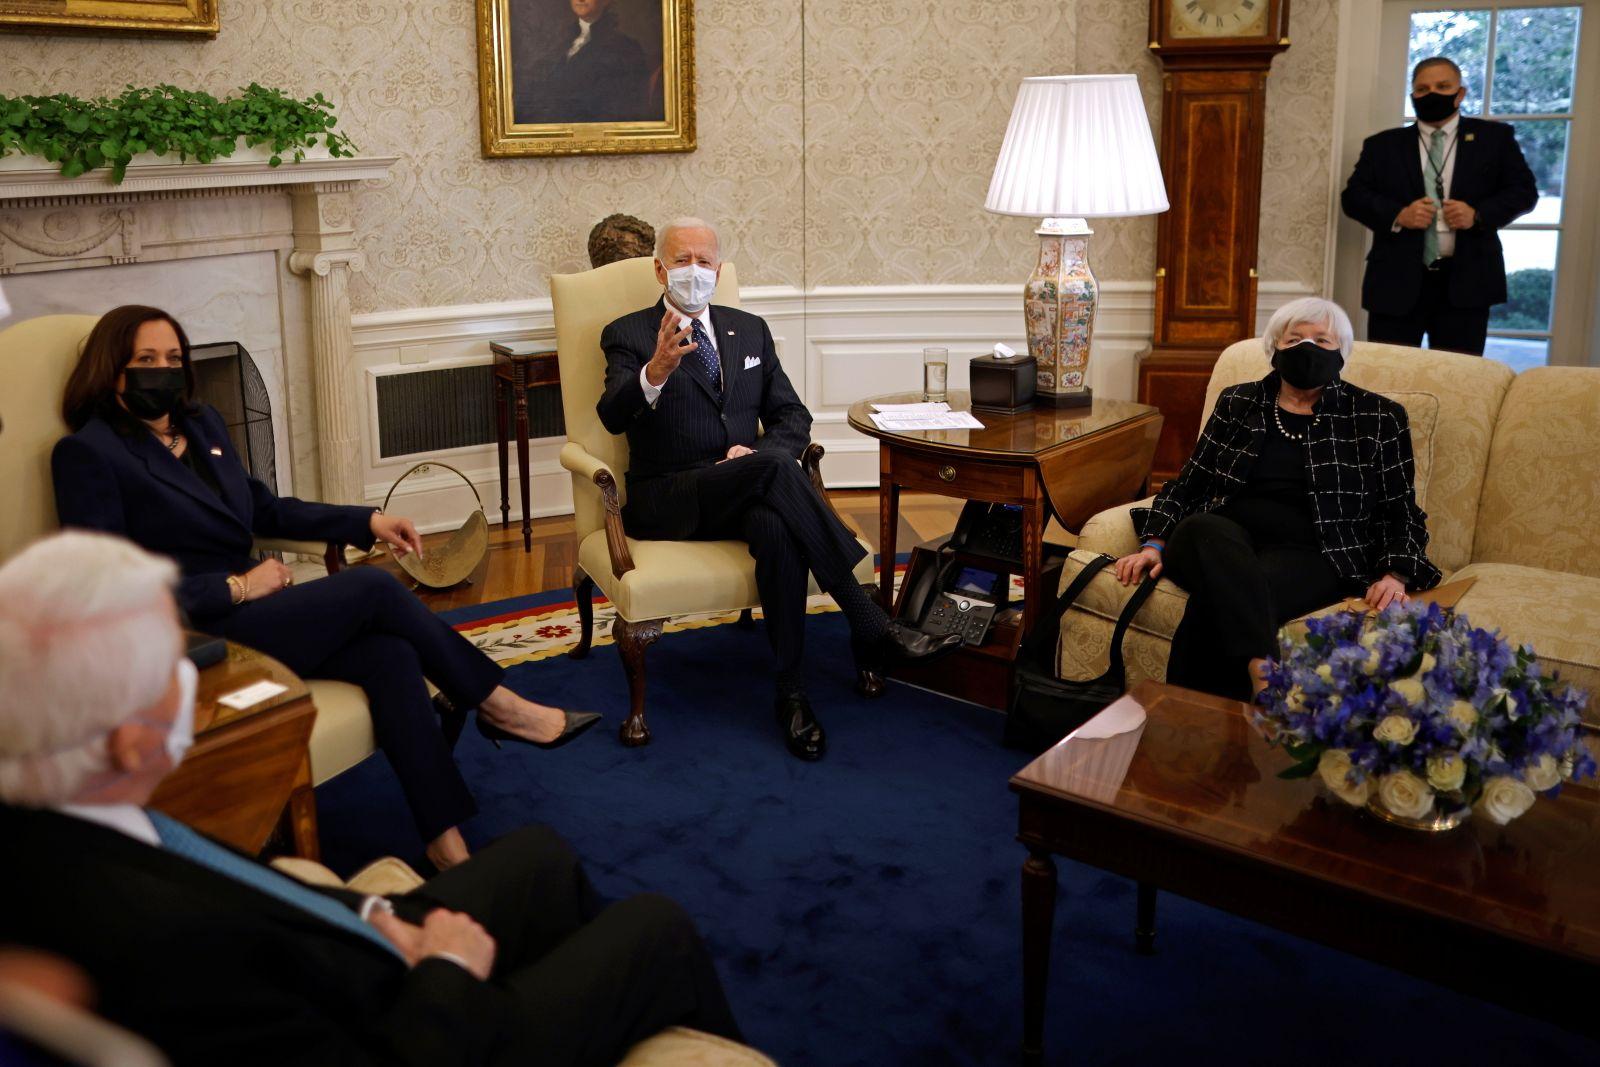 U.S. President Joe Biden and U.S. Vice President Kamala Harris, accompanied by U.S. Treasury Secretary Janet Yellen attend a meeting business leaders at the Oval Office of the White House in Washington, U.S.